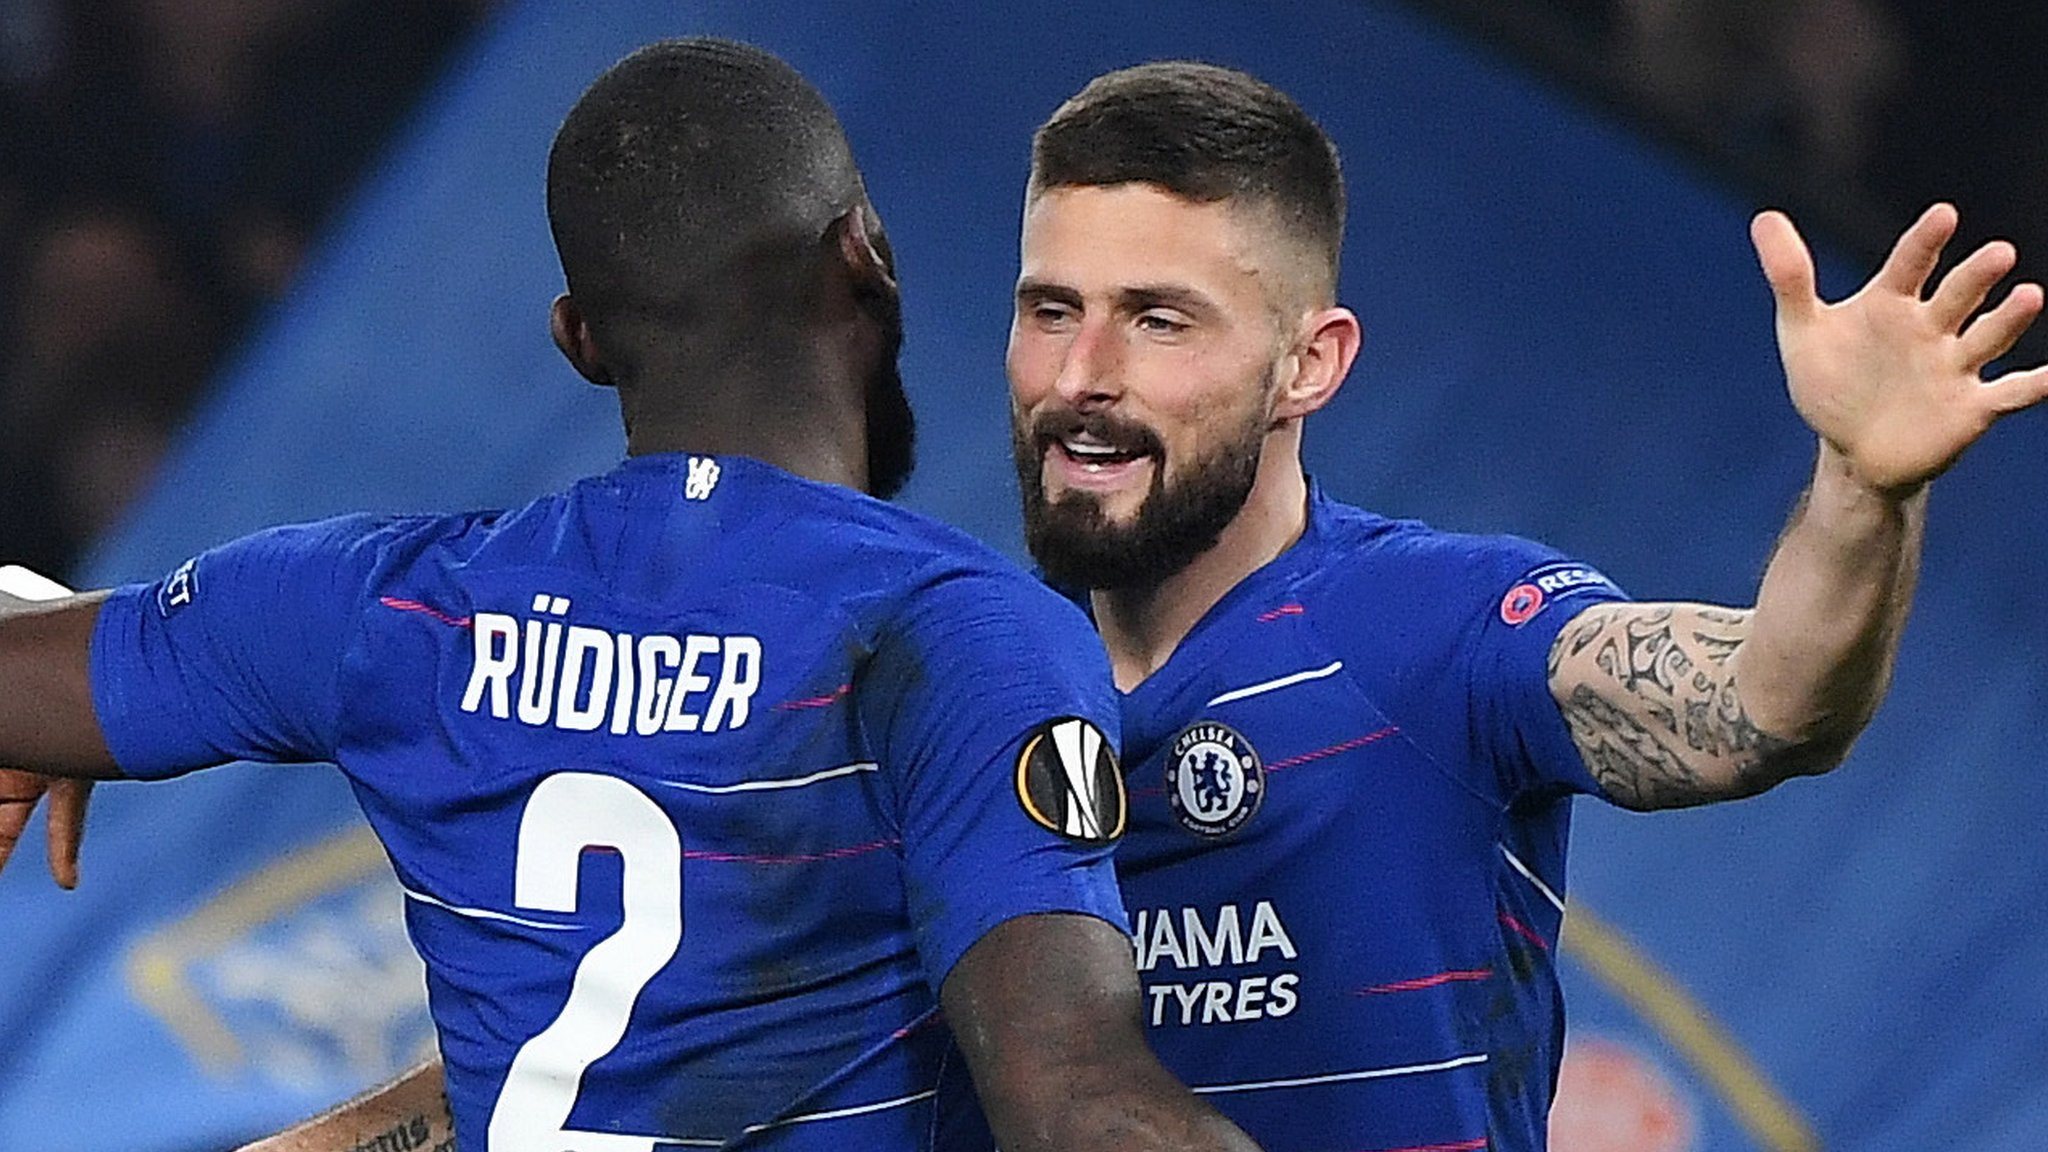 Chelsea beat Malmo to reach last 16 of Europa League